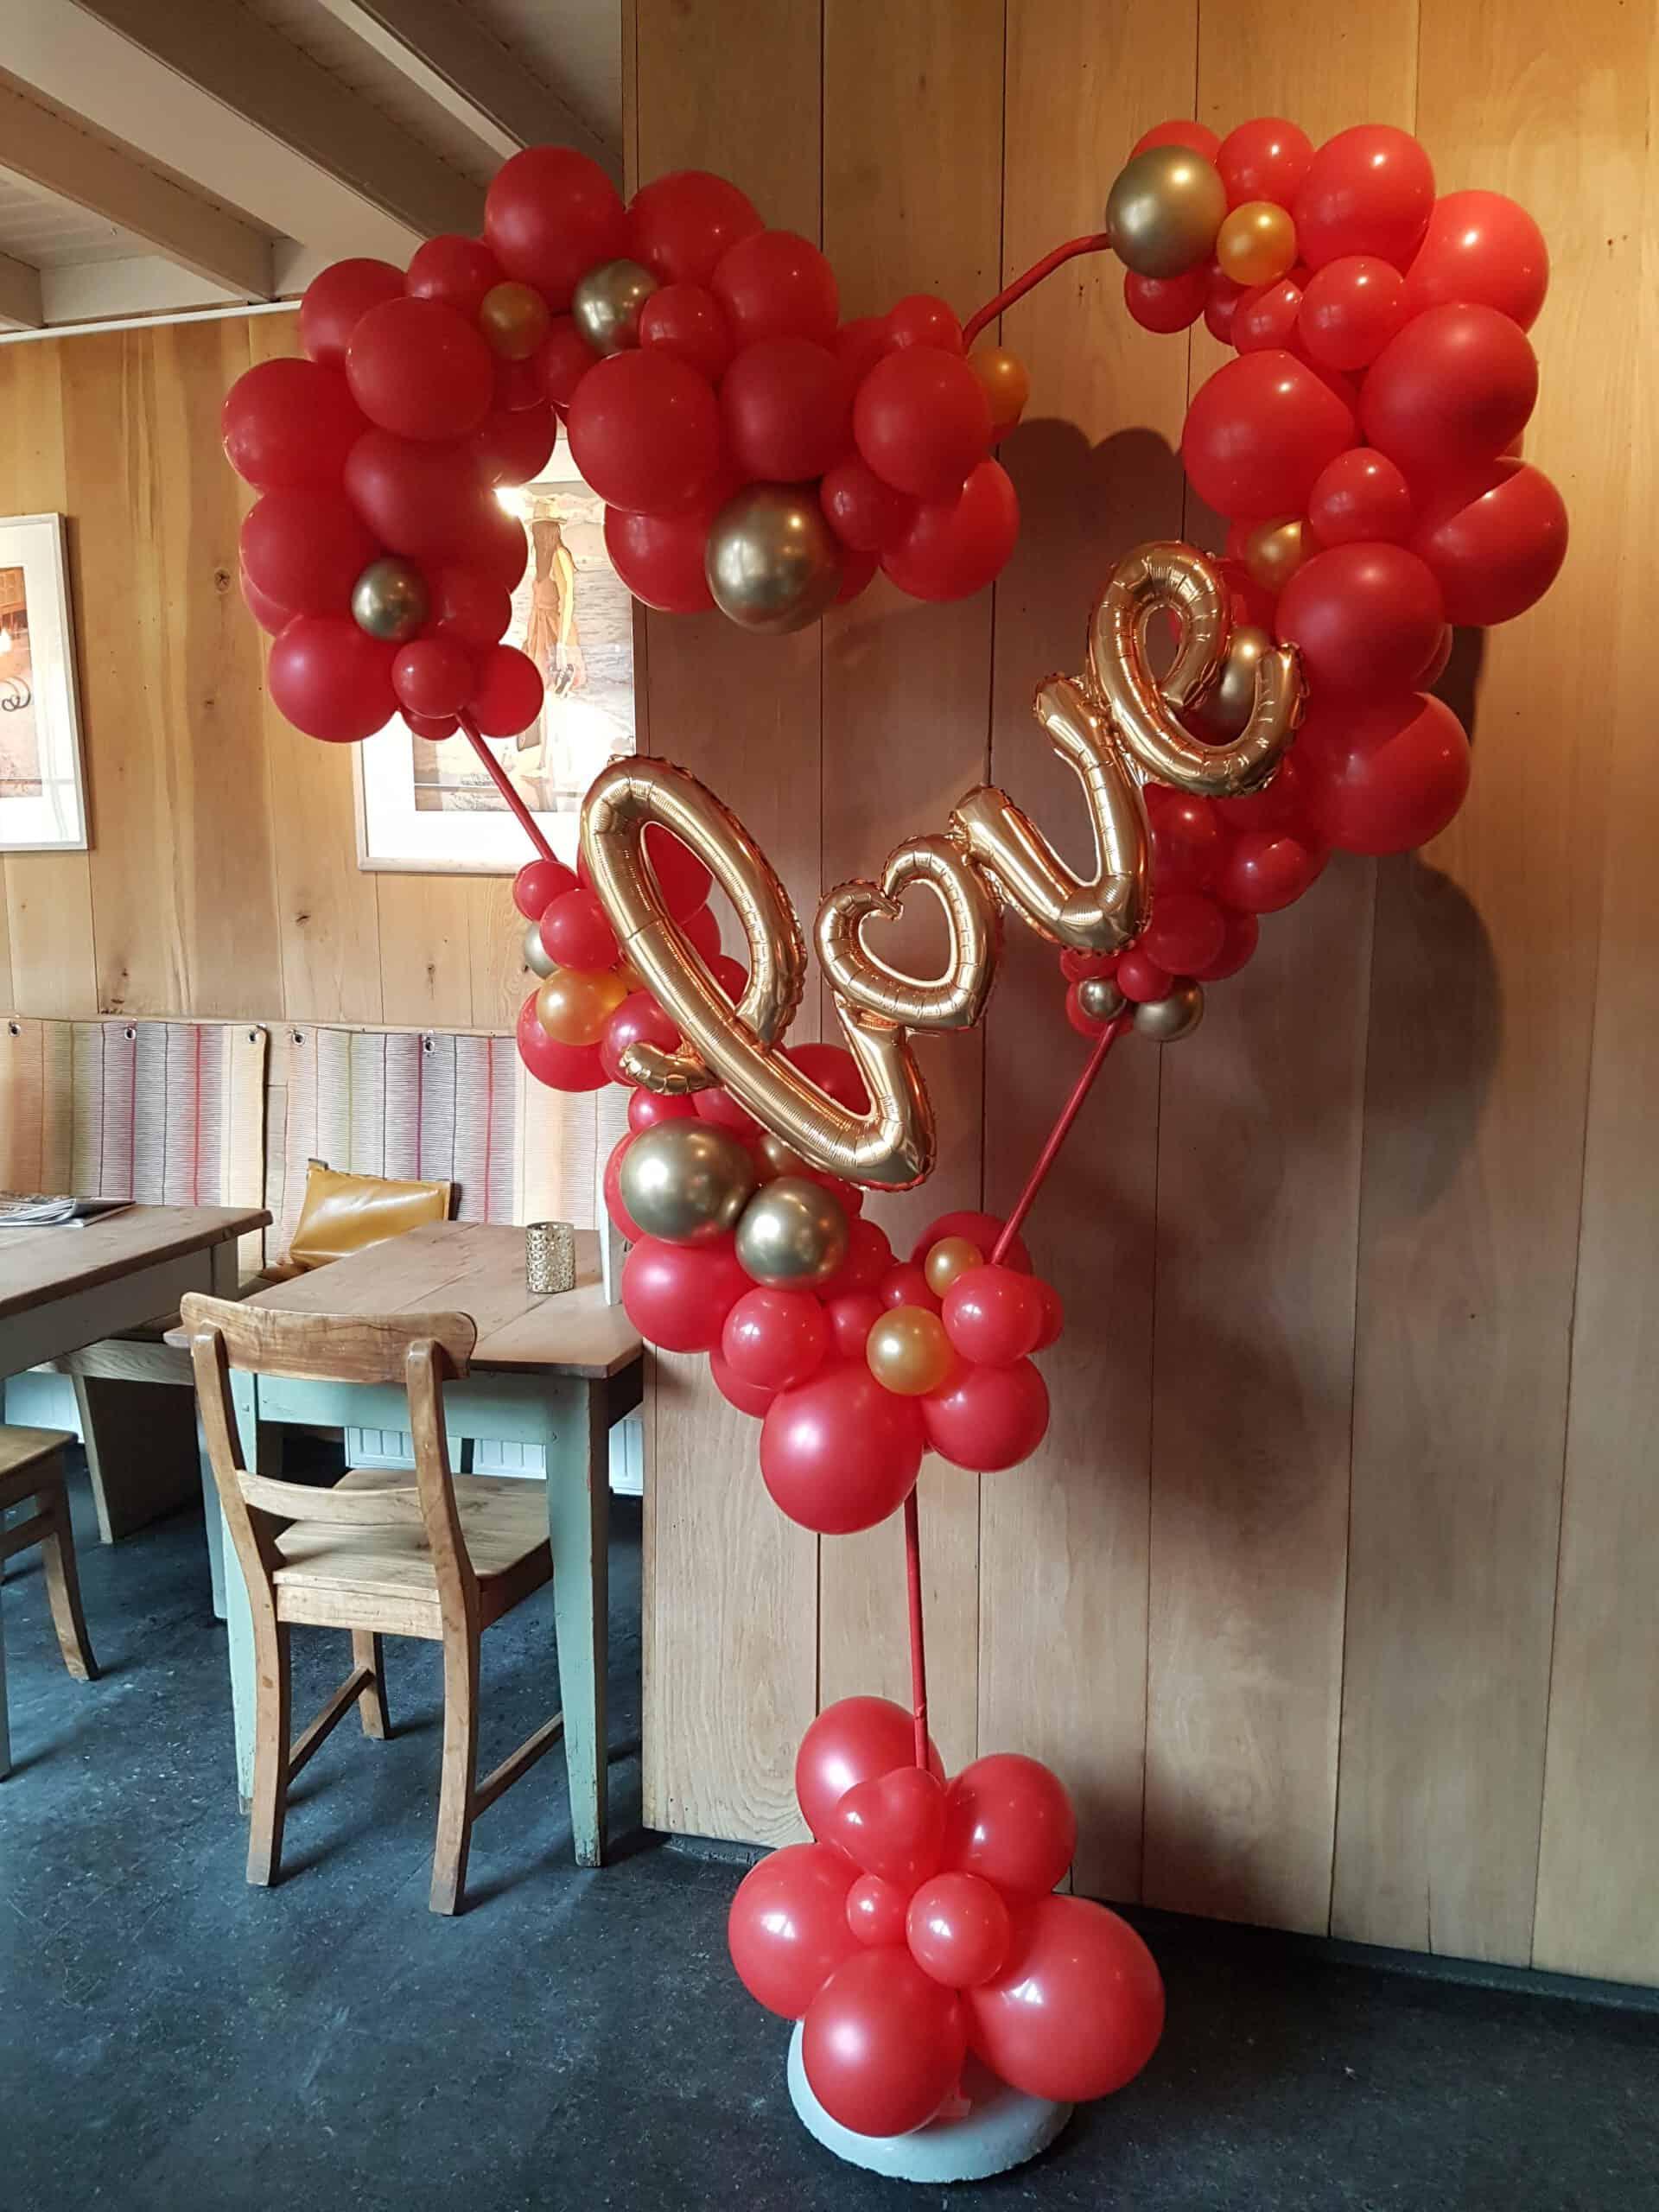 20200214 112918 scaled - Organic ballondecoratie van allerlei maten ballonnen